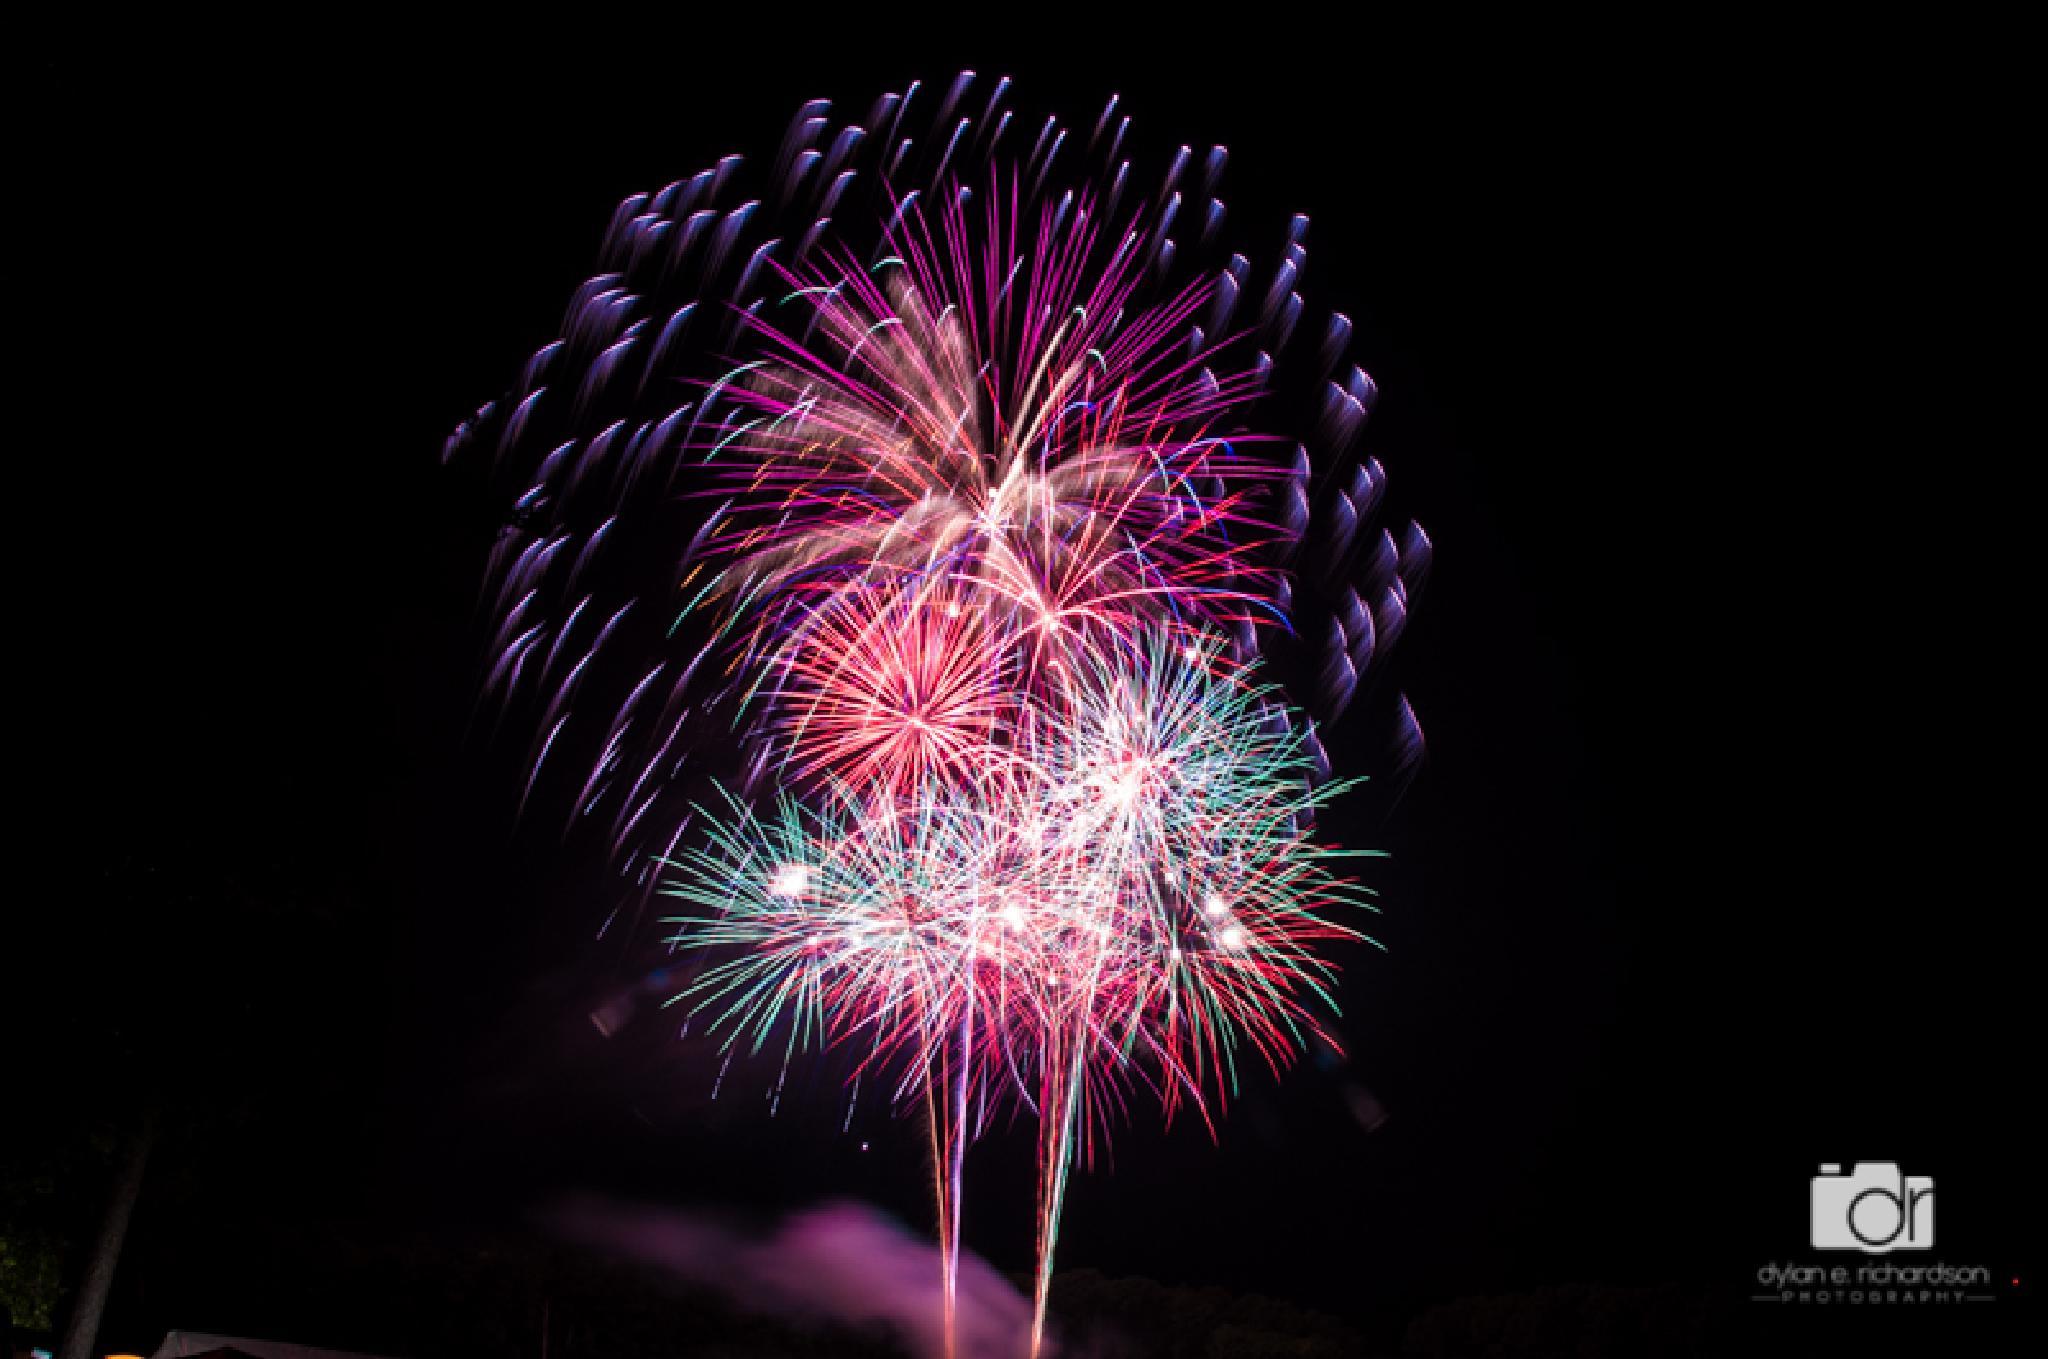 Fireworks 2283 by dronline841